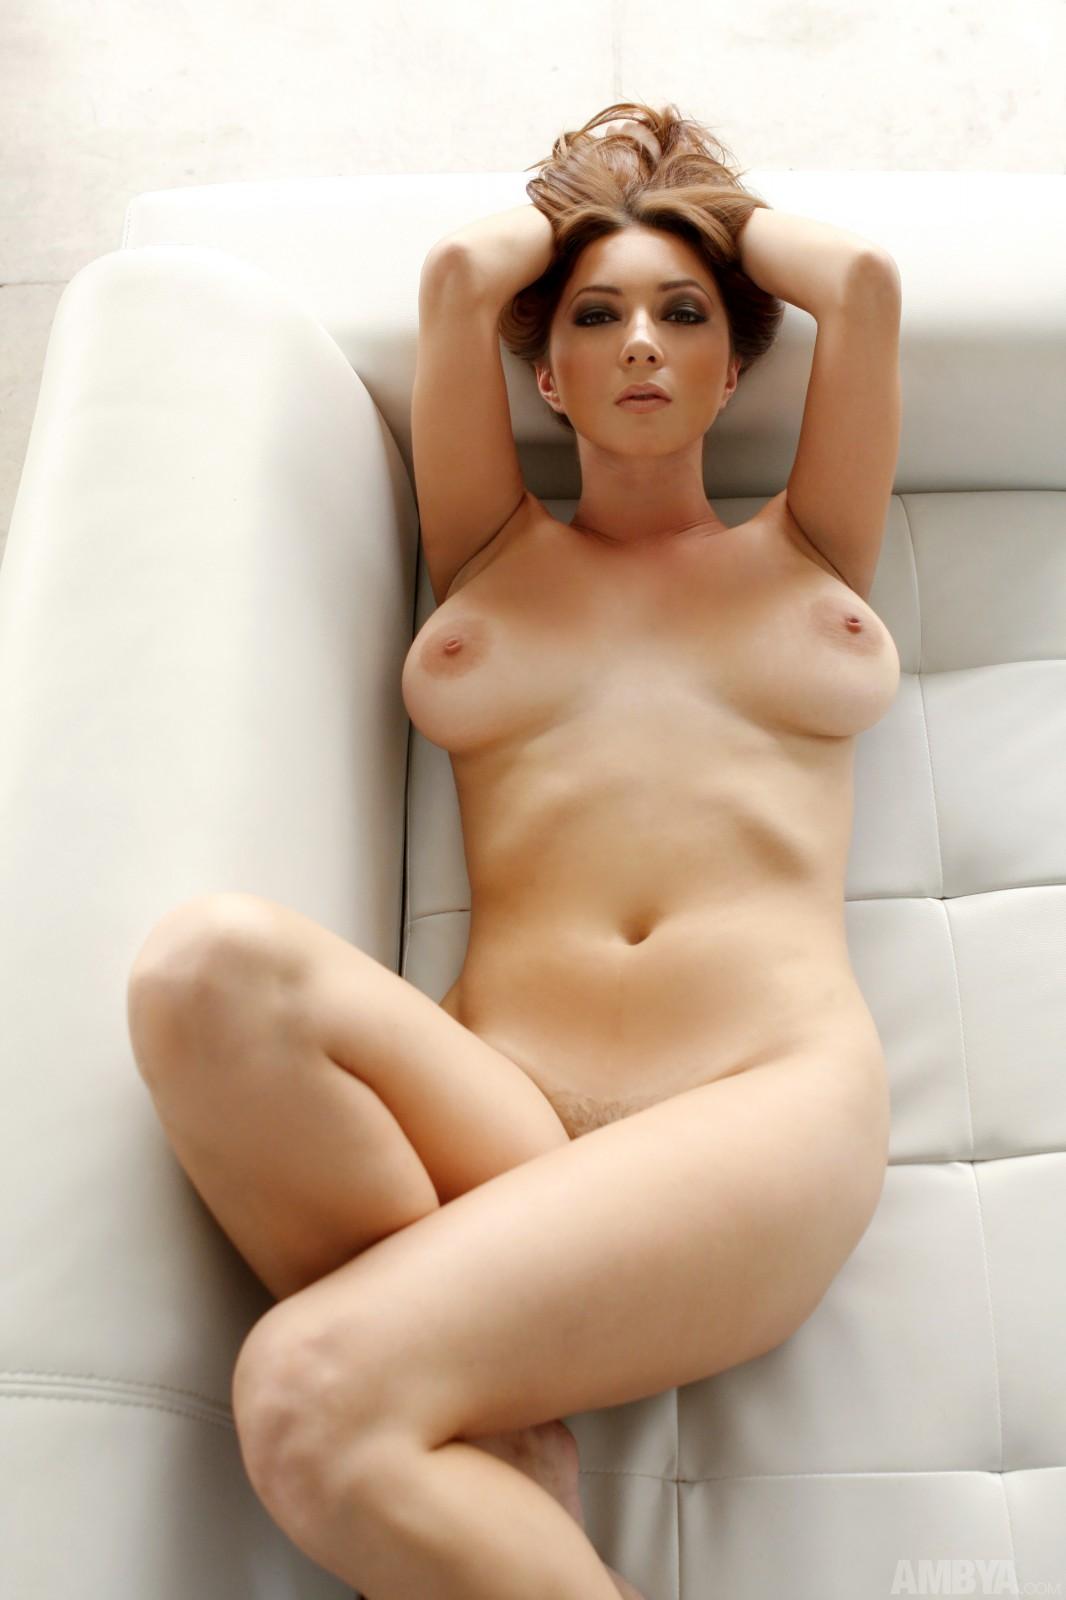 sex escort sites fine nakne damer